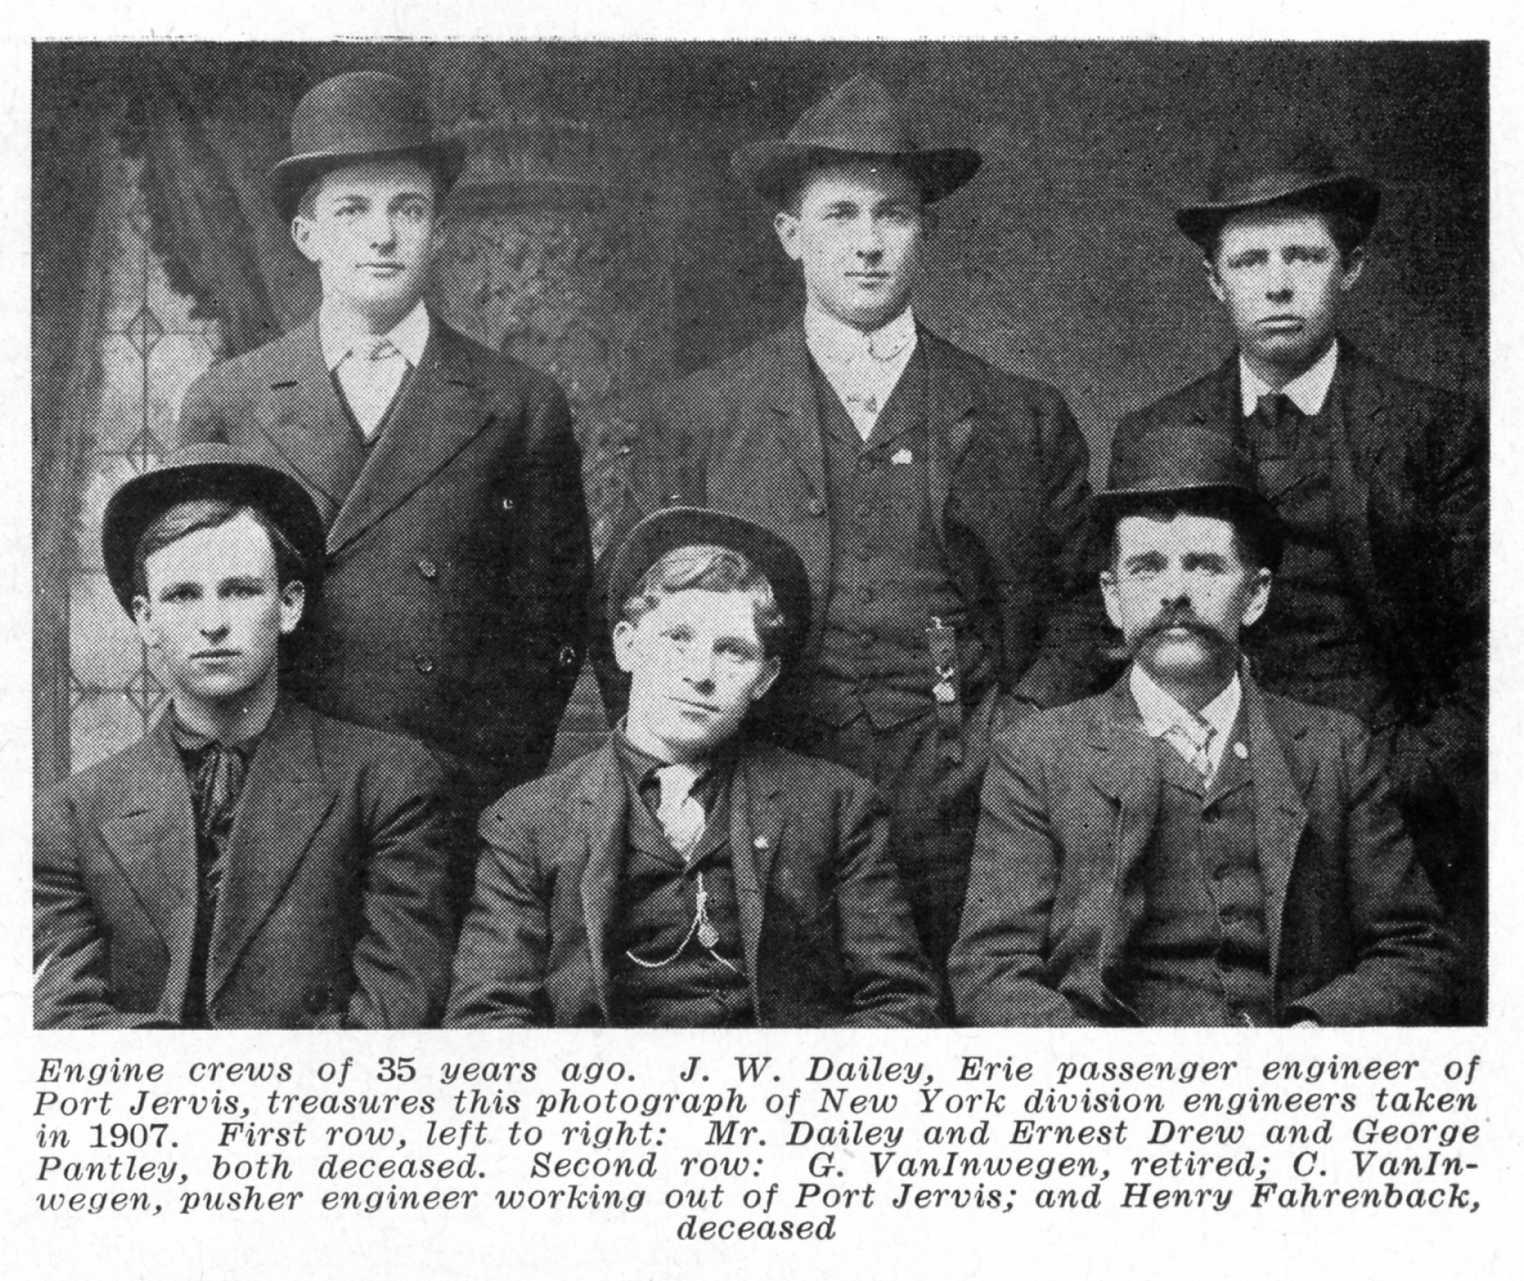 Erie Railroad Magazine Employee Master Index